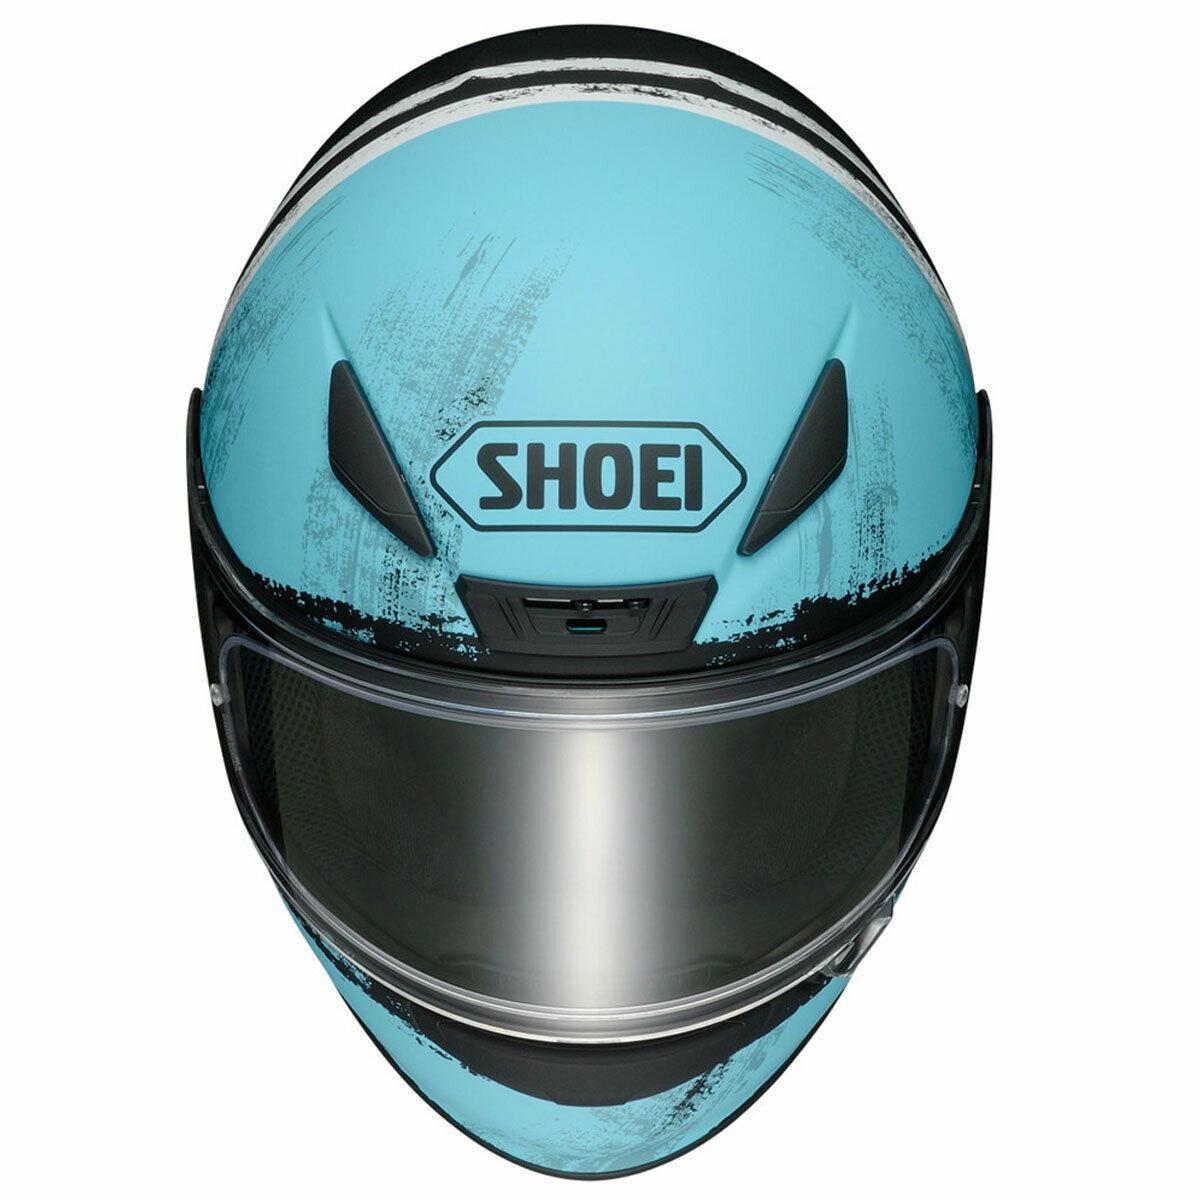 Shoei-NXR-Full-Face-Motorcycle-Motorbike-Premium-Helmet-RF-1200 thumbnail 25